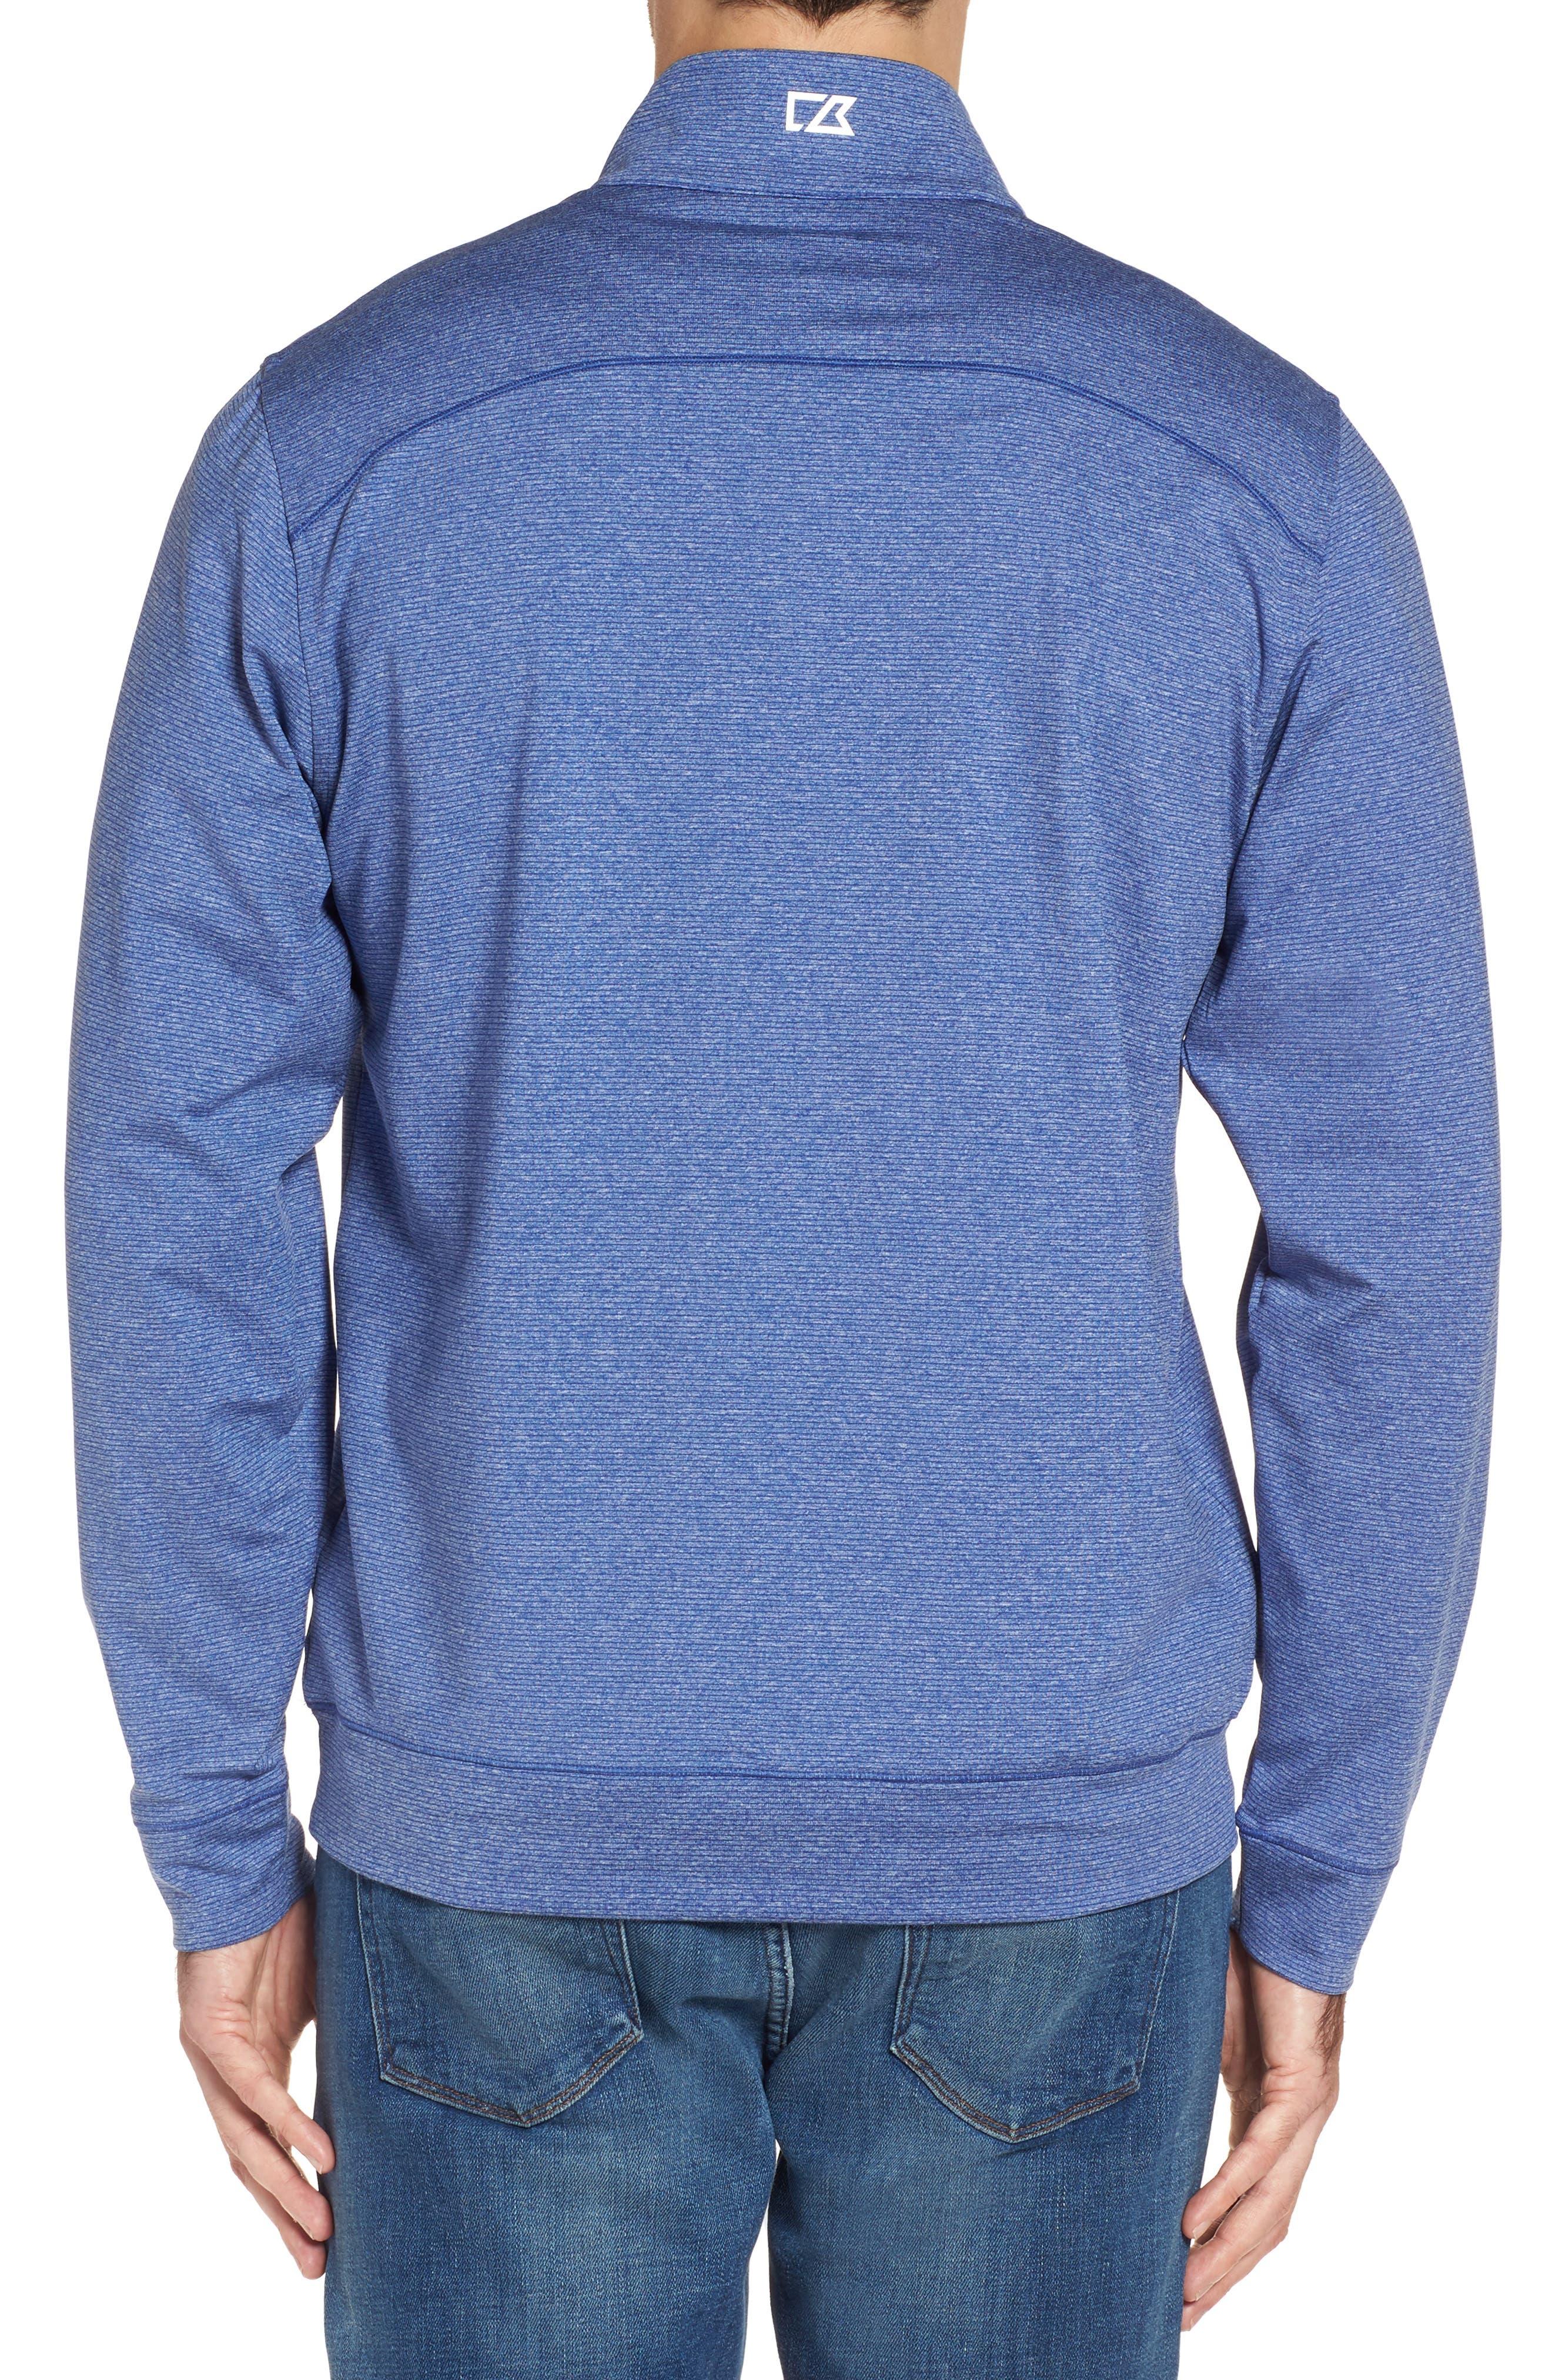 Shoreline - New York Giants Half Zip Pullover,                             Alternate thumbnail 2, color,                             425